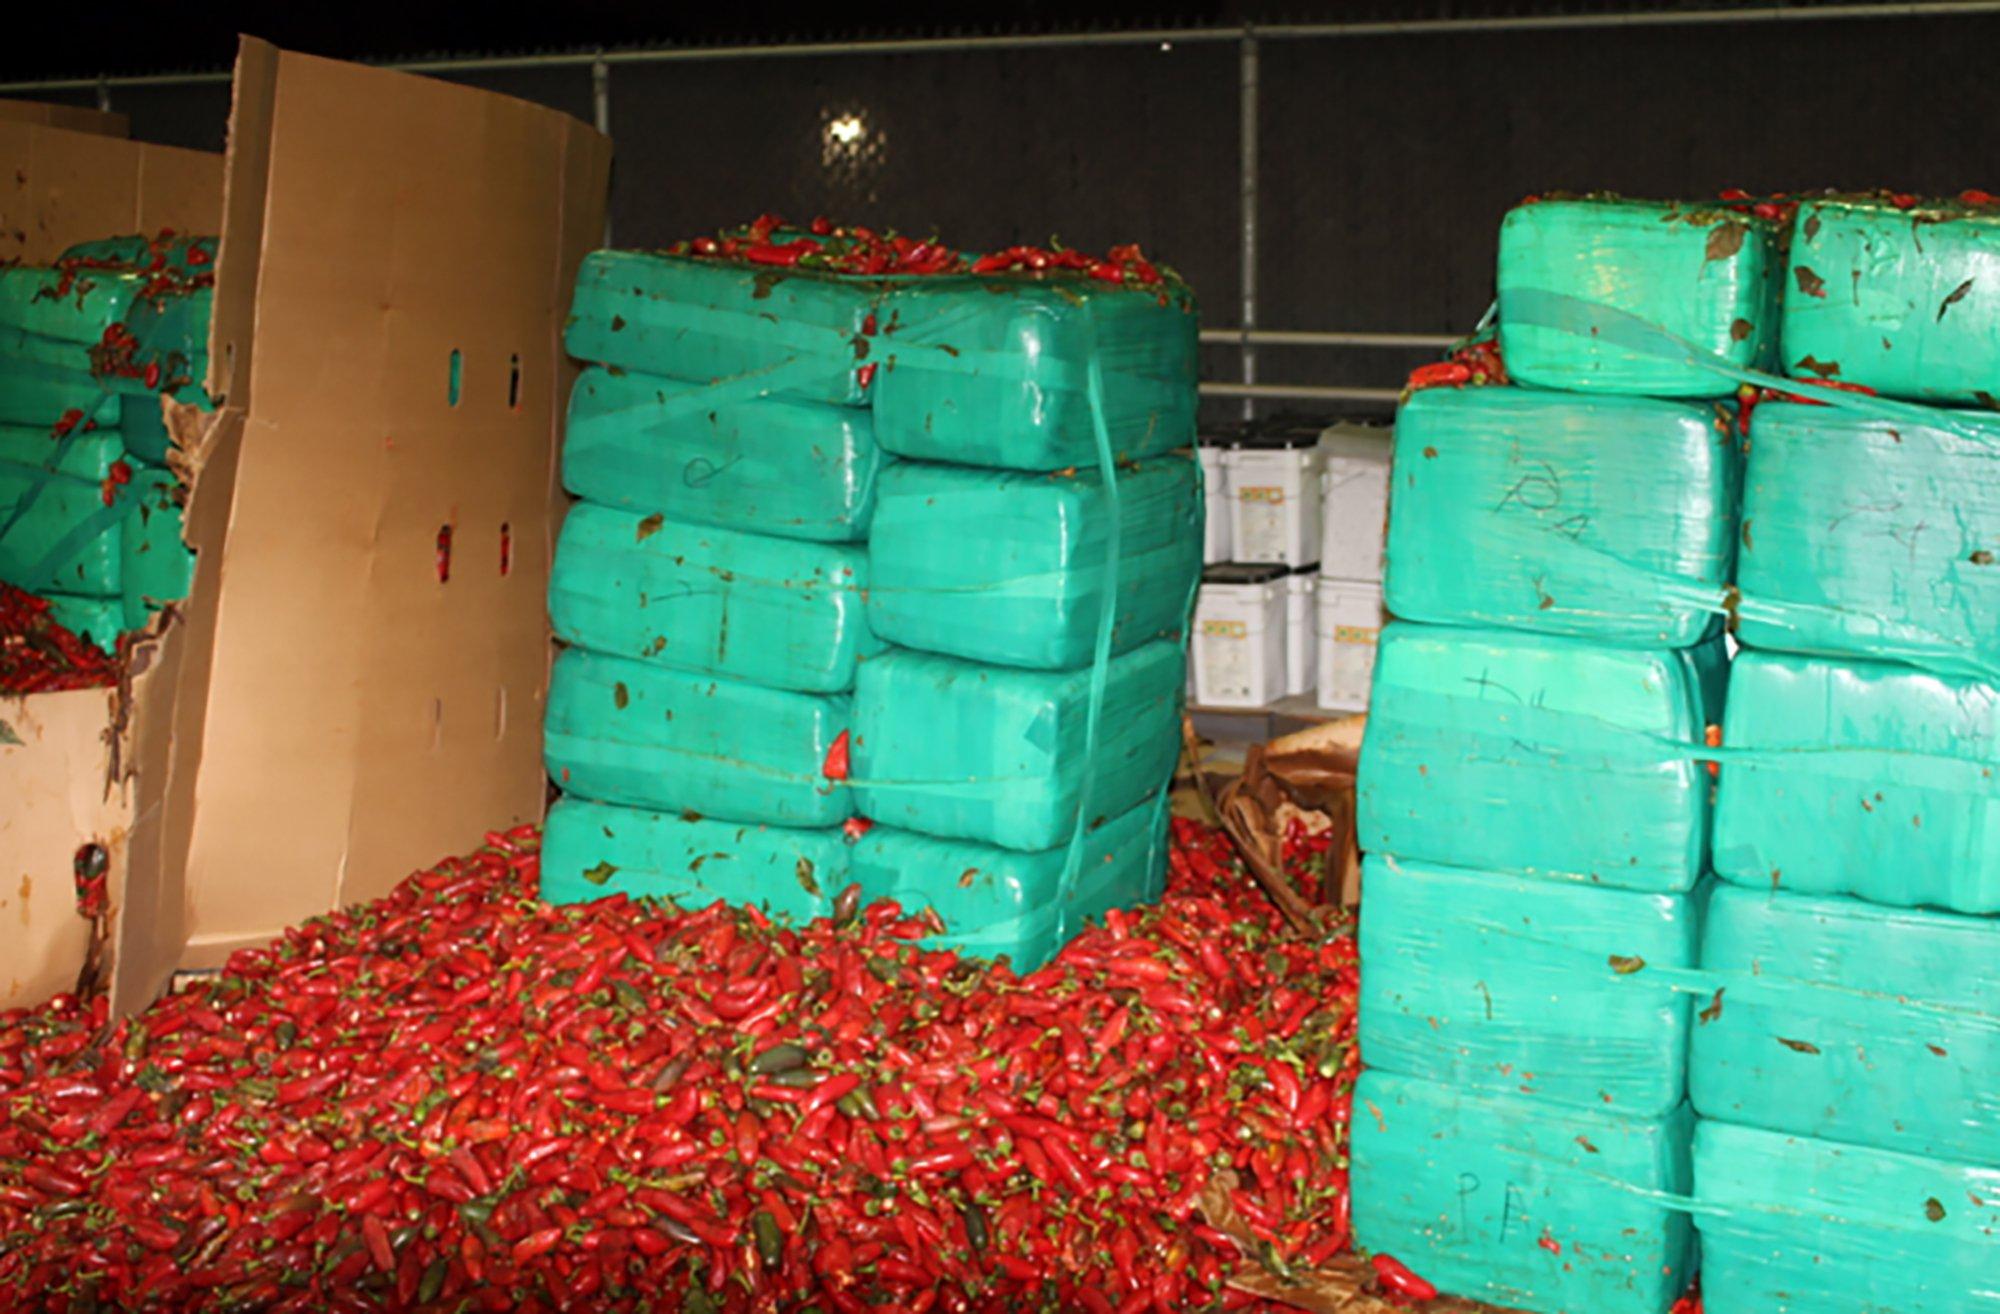 Officials seize marijuana mixed with jalapeño peppers